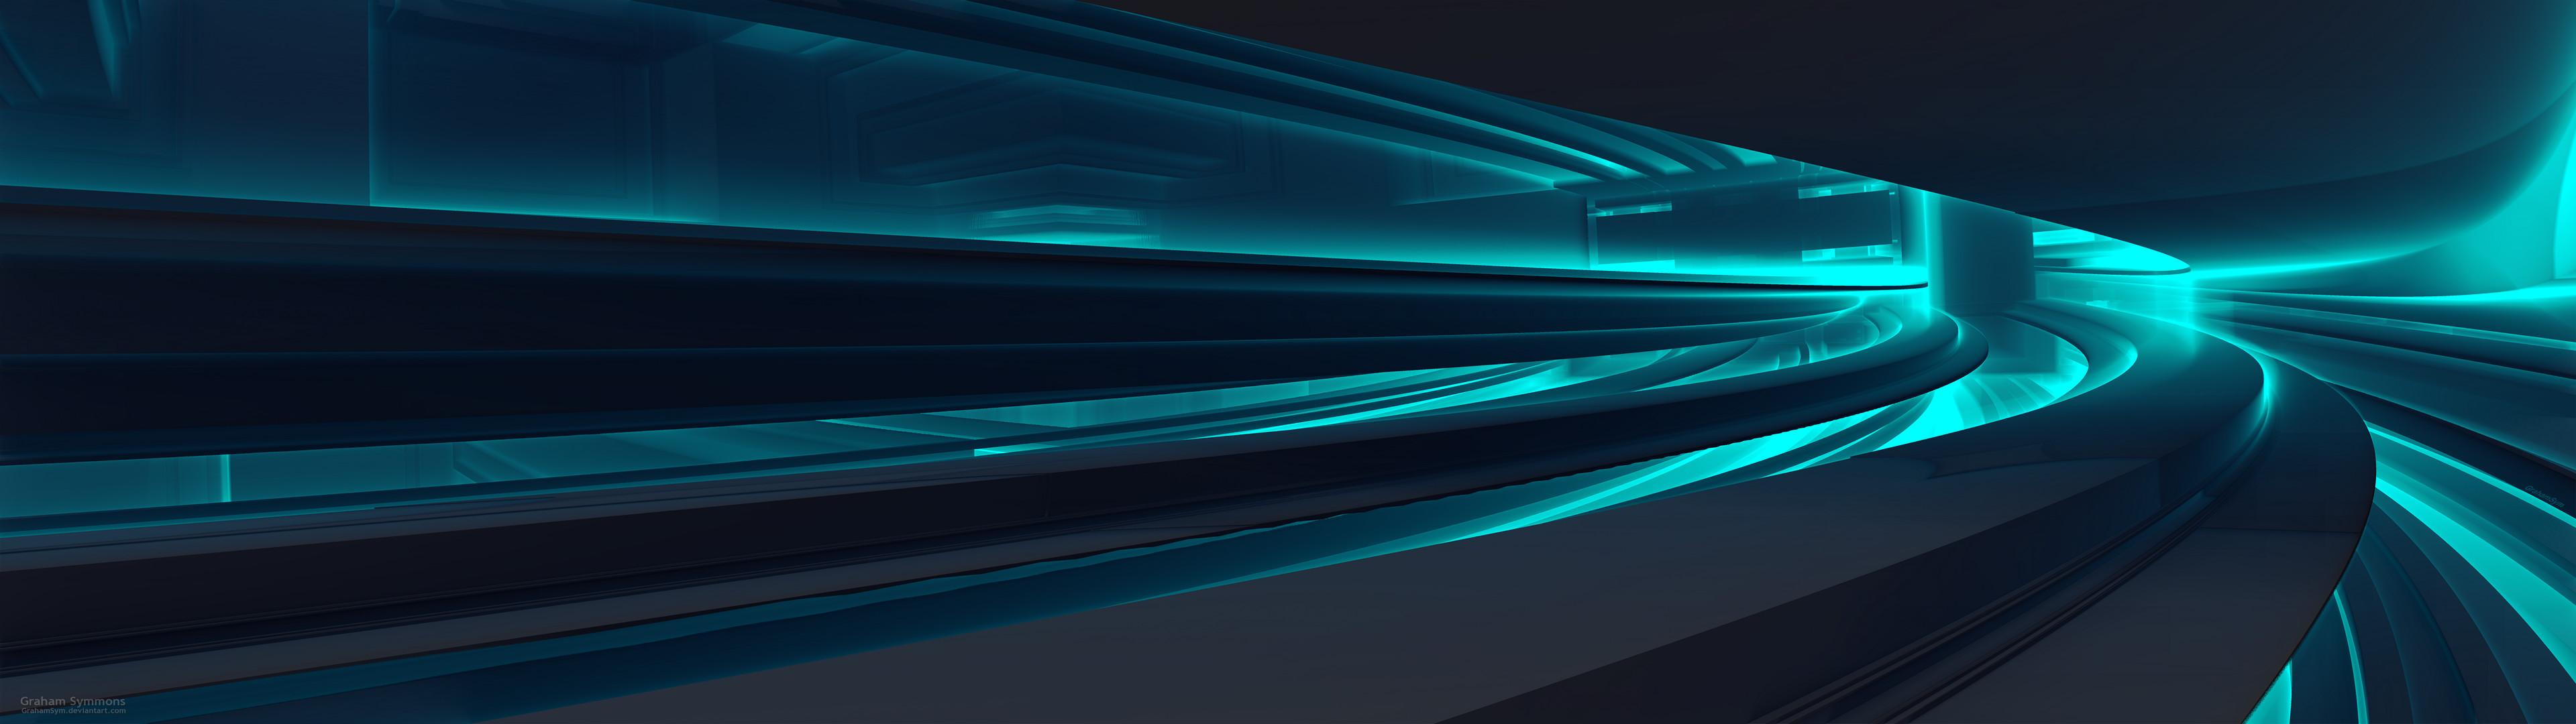 Underpass-Dual Display Fractal by GrahamSym on DeviantArt